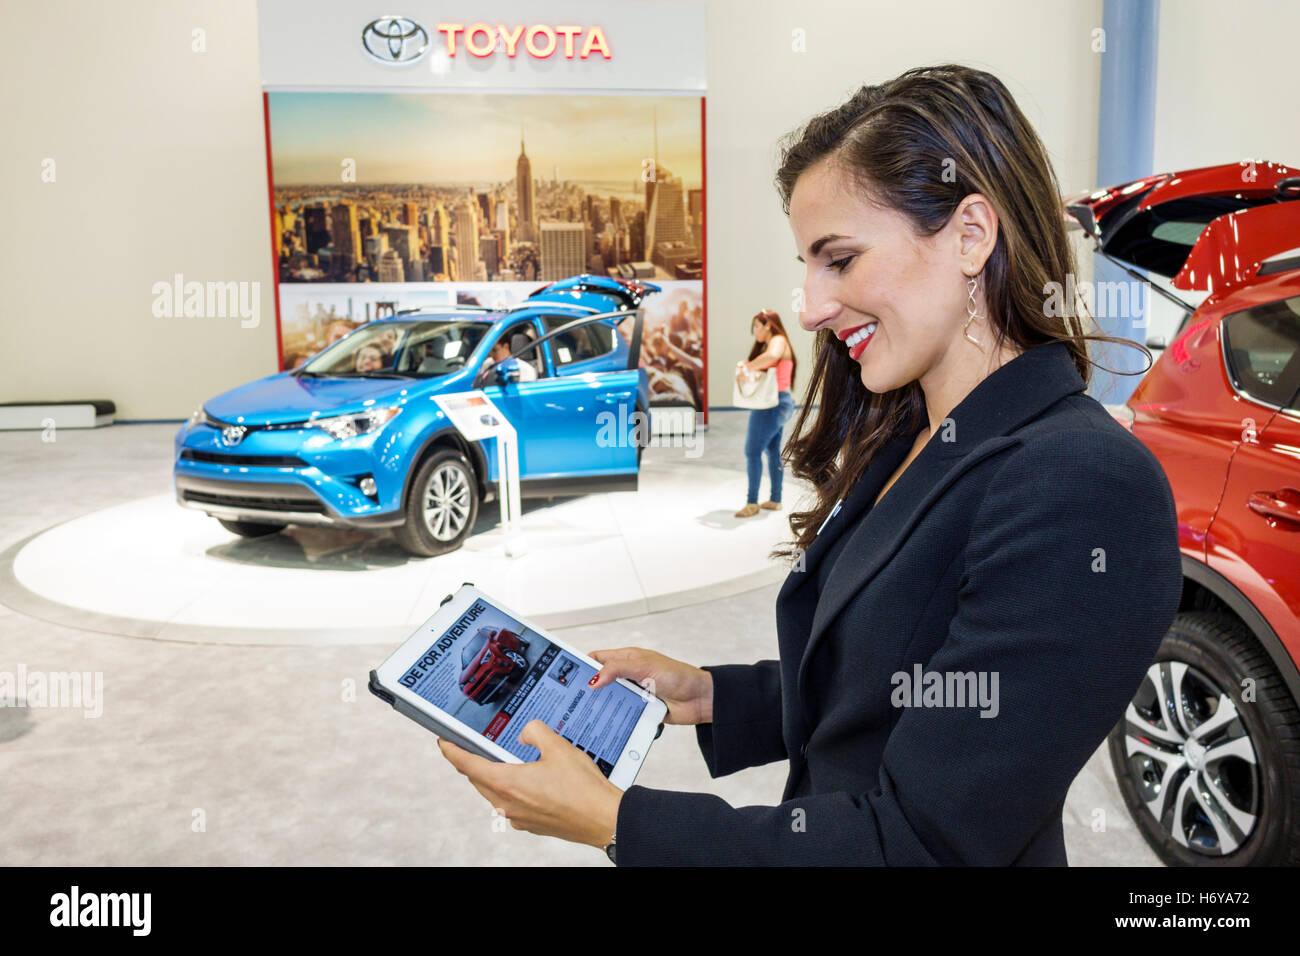 Florida miami beach convention center centre interior international auto show new models shopping toyota woman representative